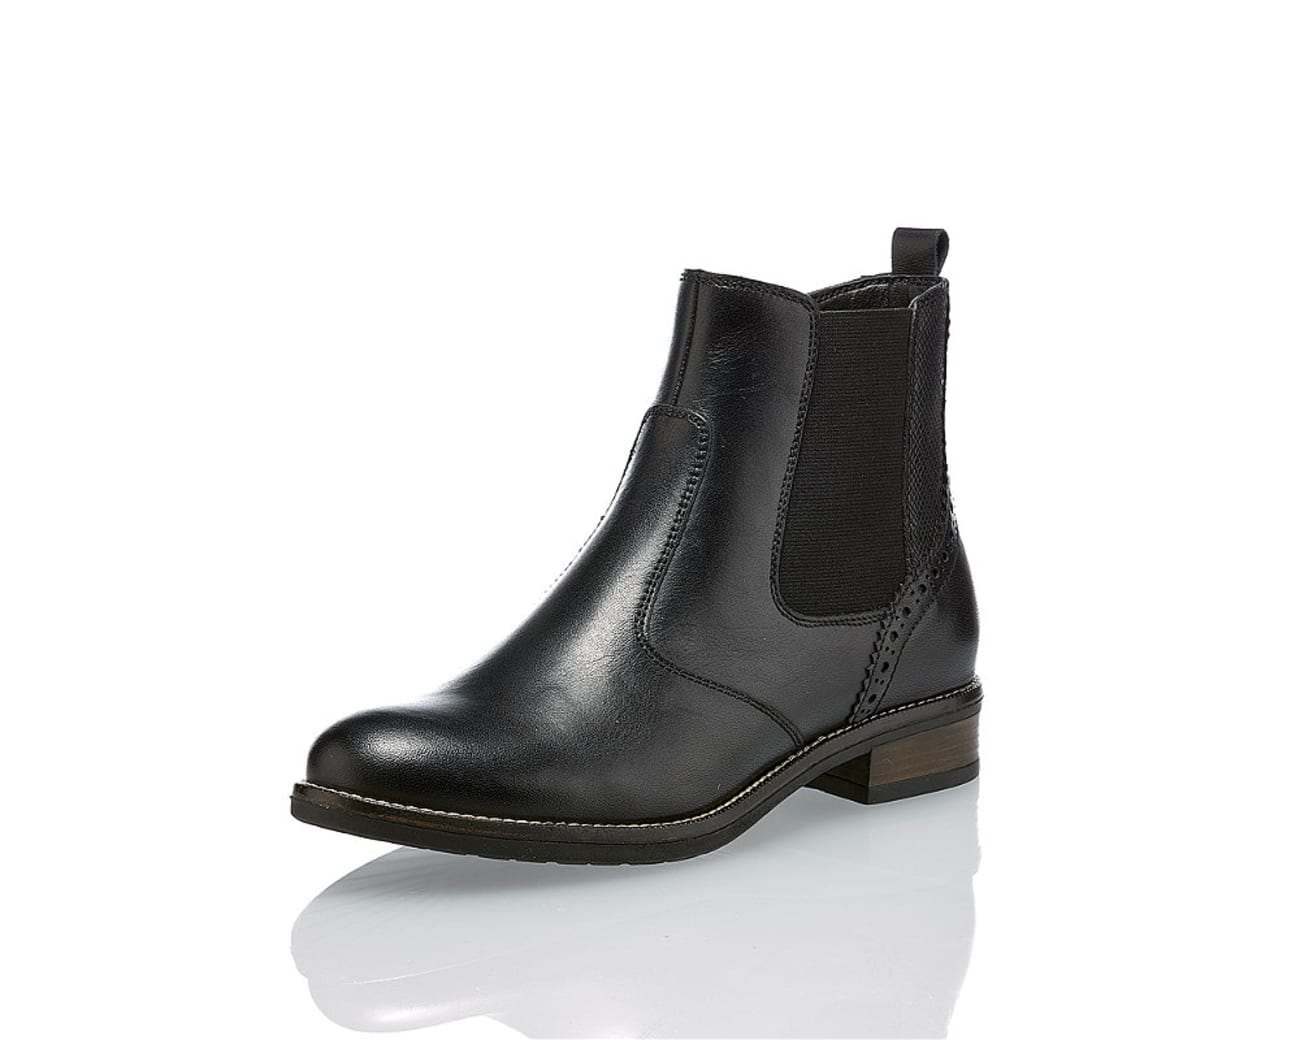 e5085f84f996bc Varese Cairo Damen Chelsea Boot Schwarz. 119.90 CHF. Filiale suchenOnline  kaufen